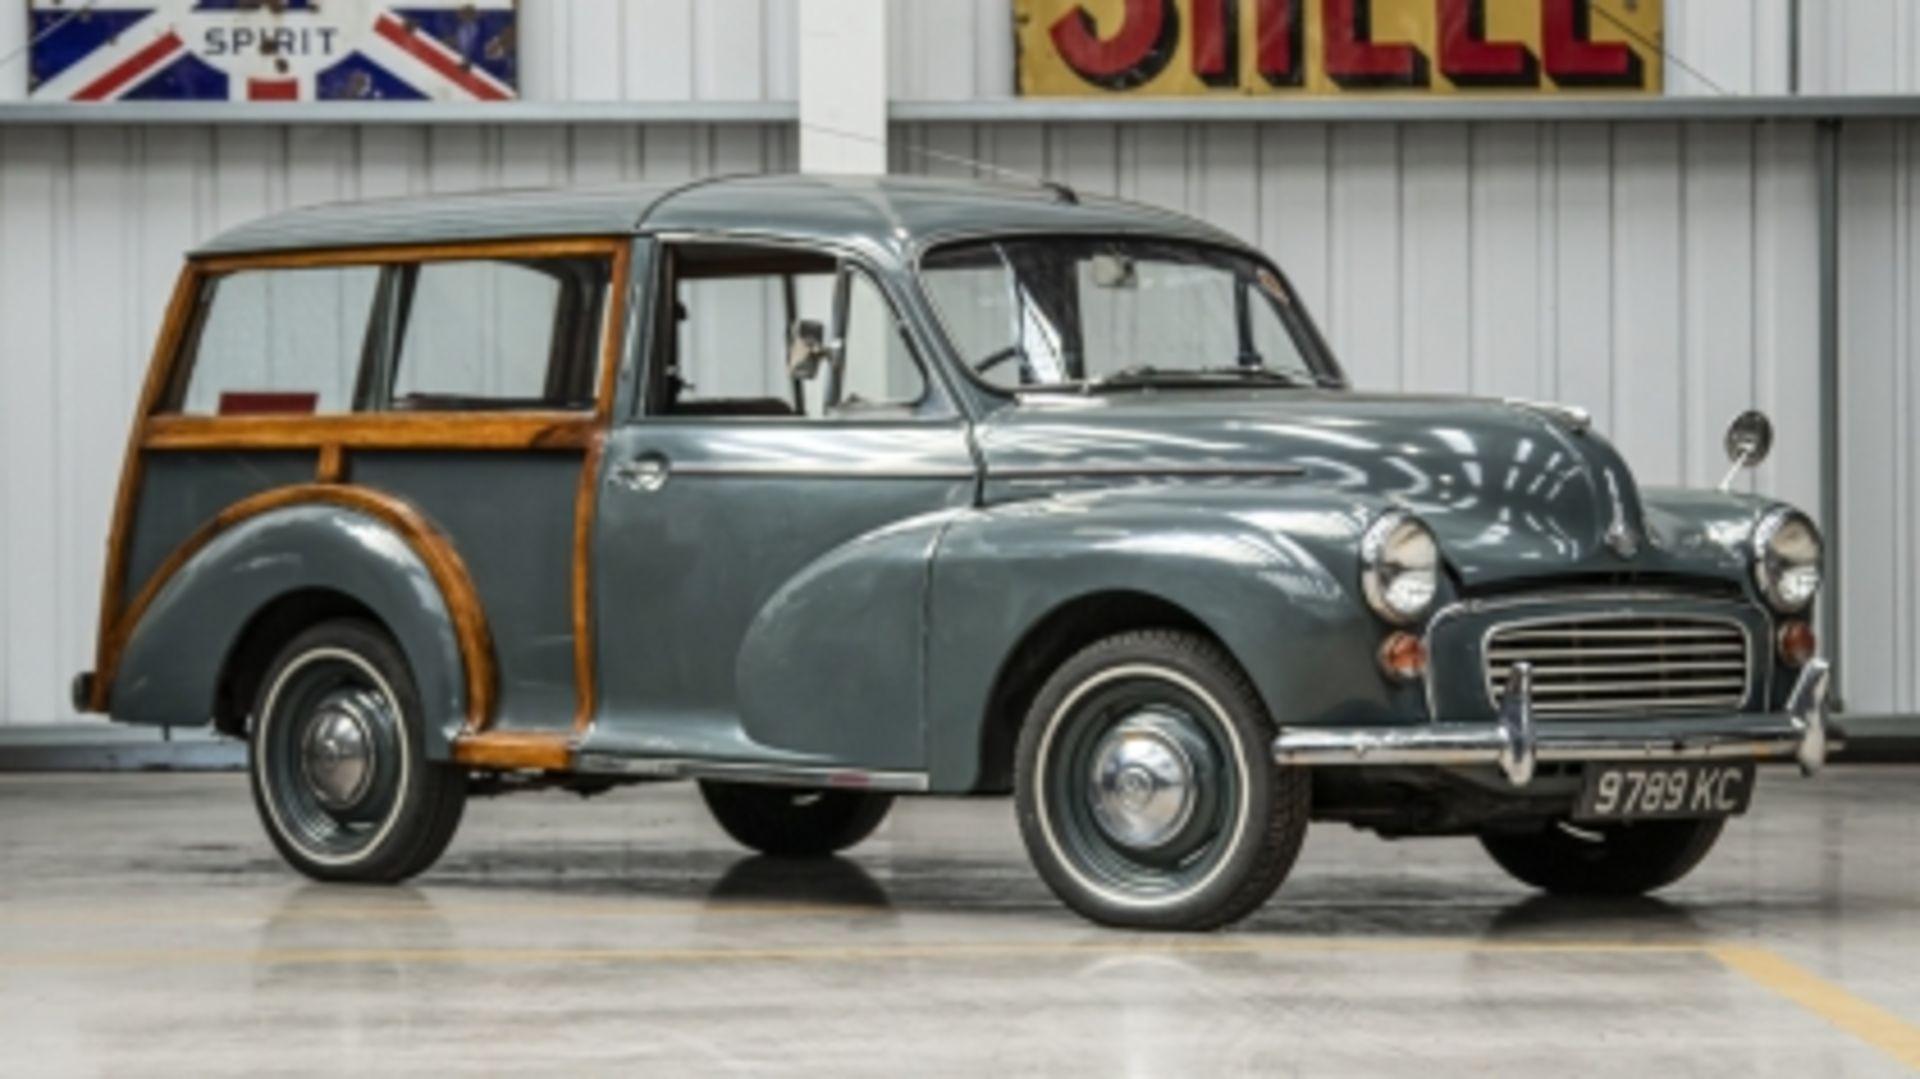 Lot 554 - 1962 Morris Minor 1000 Series III Traveller